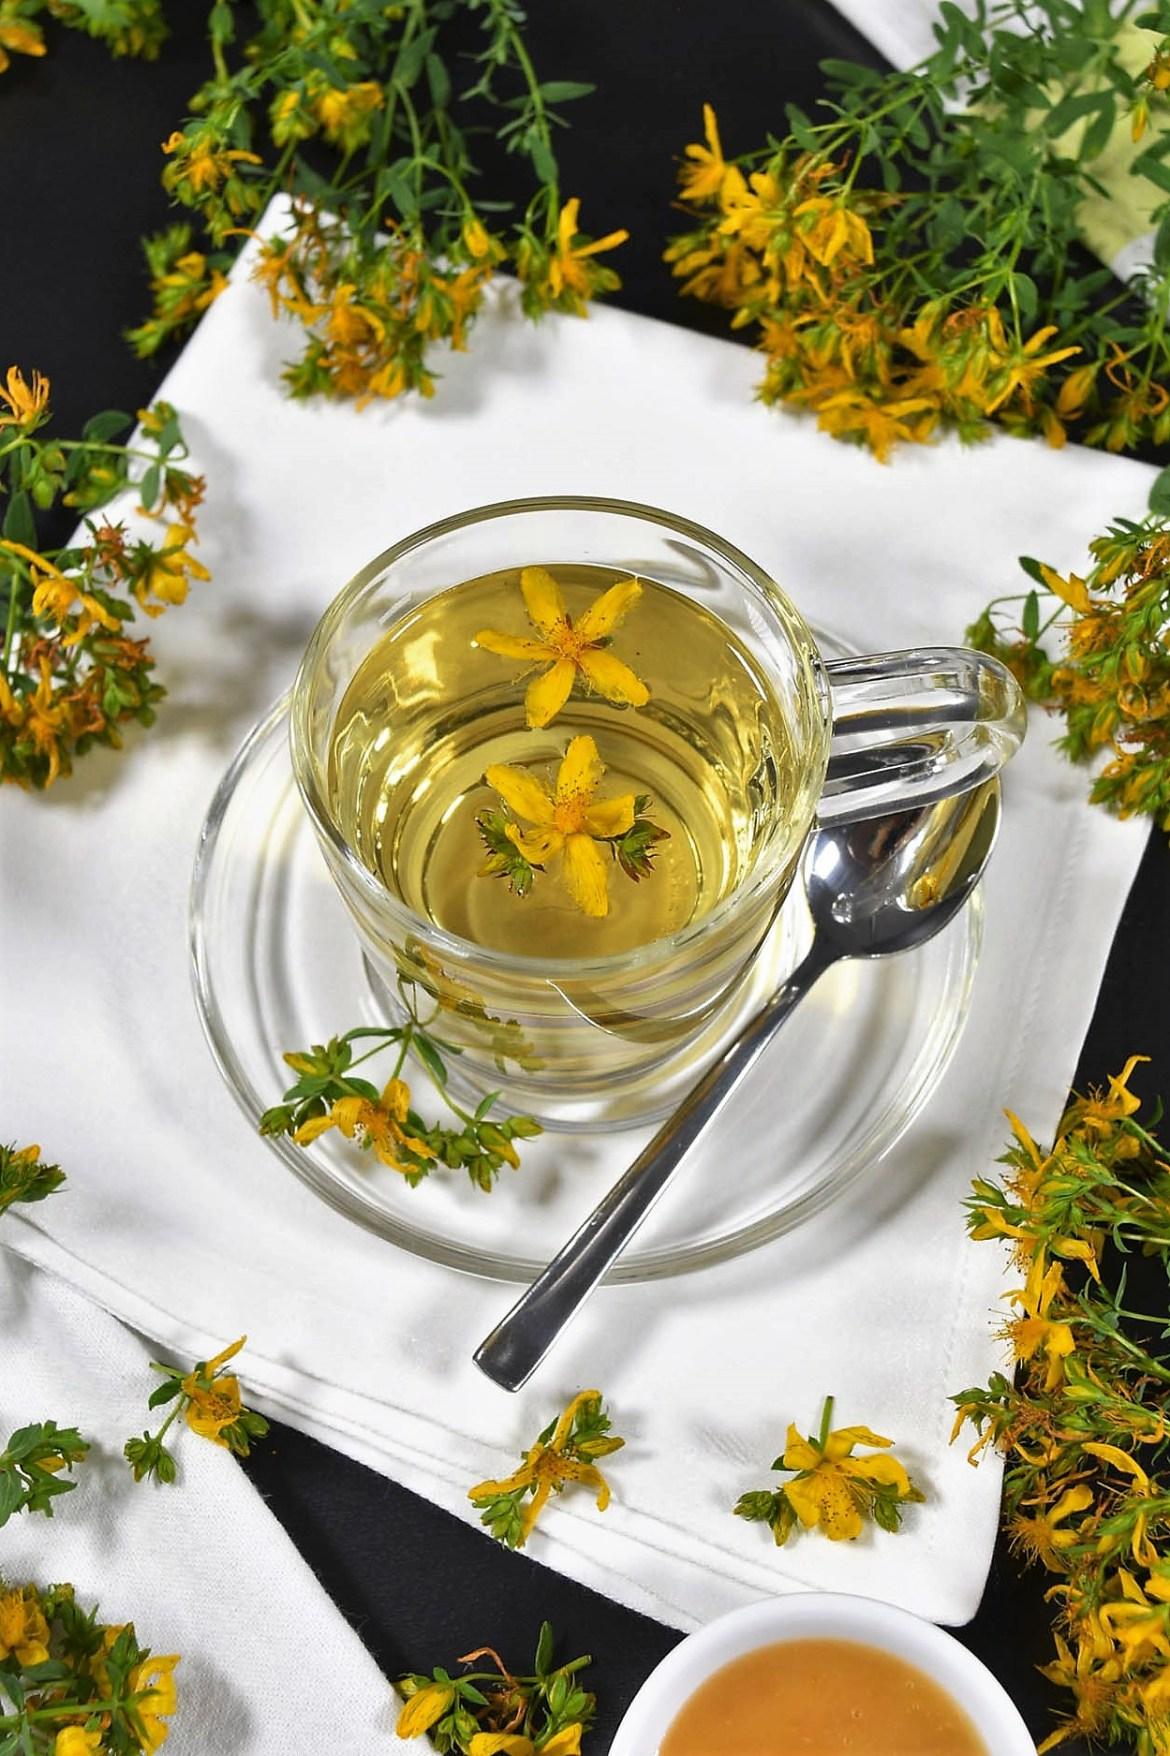 Johanniskraut Tee-Gesunde Tee-BallesWorld